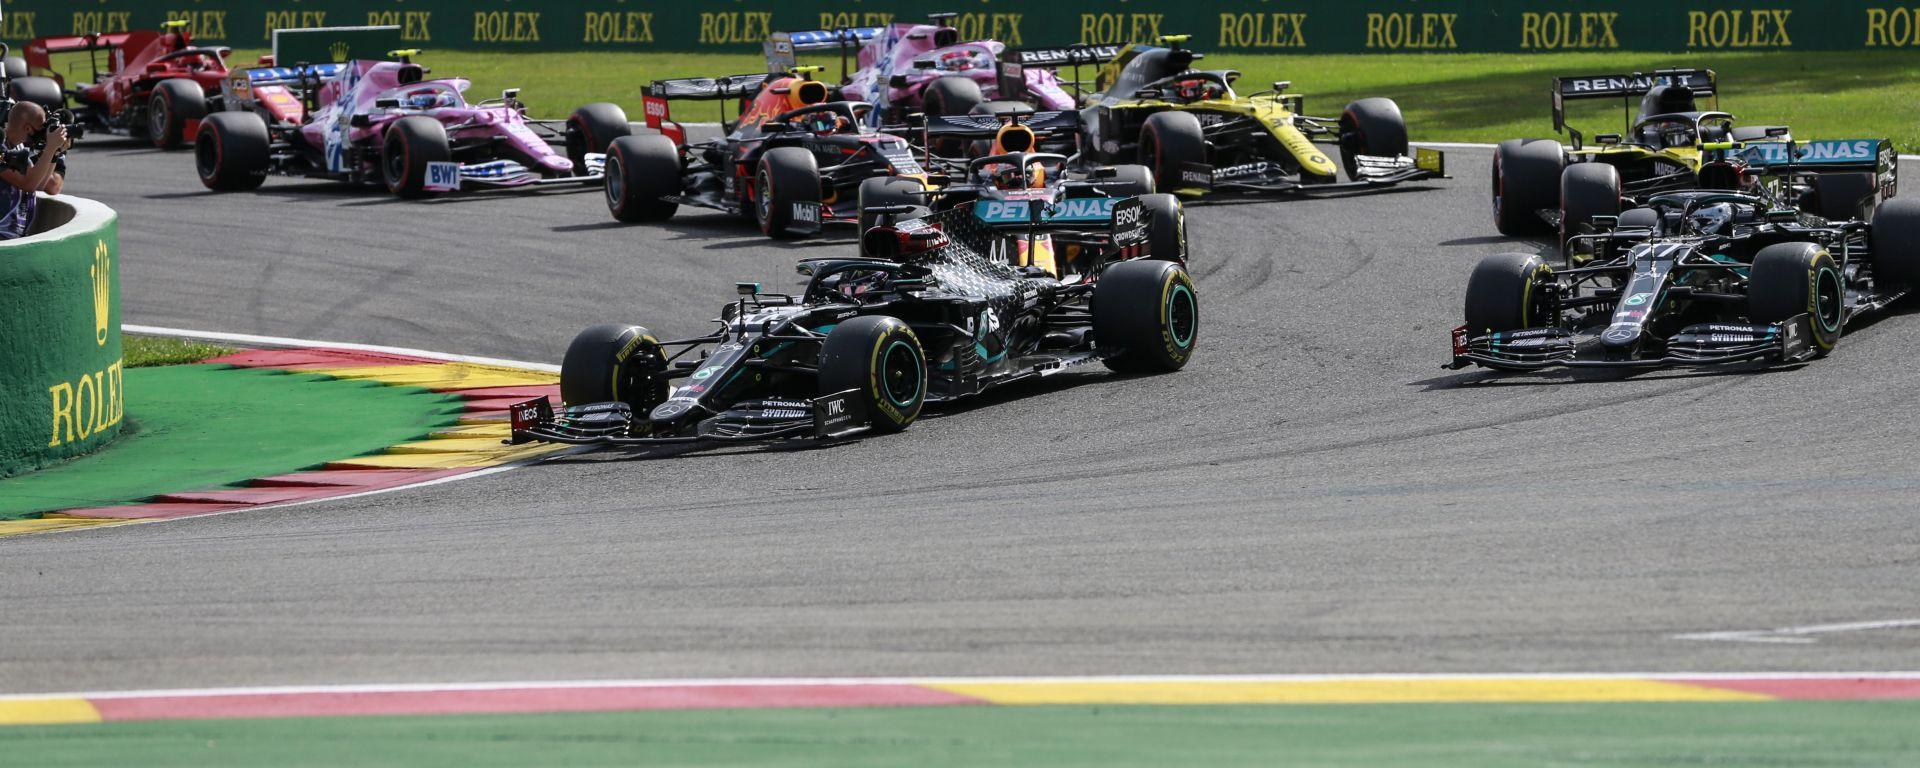 F1 GP Belgio 2020, Spa: la partenza della gara